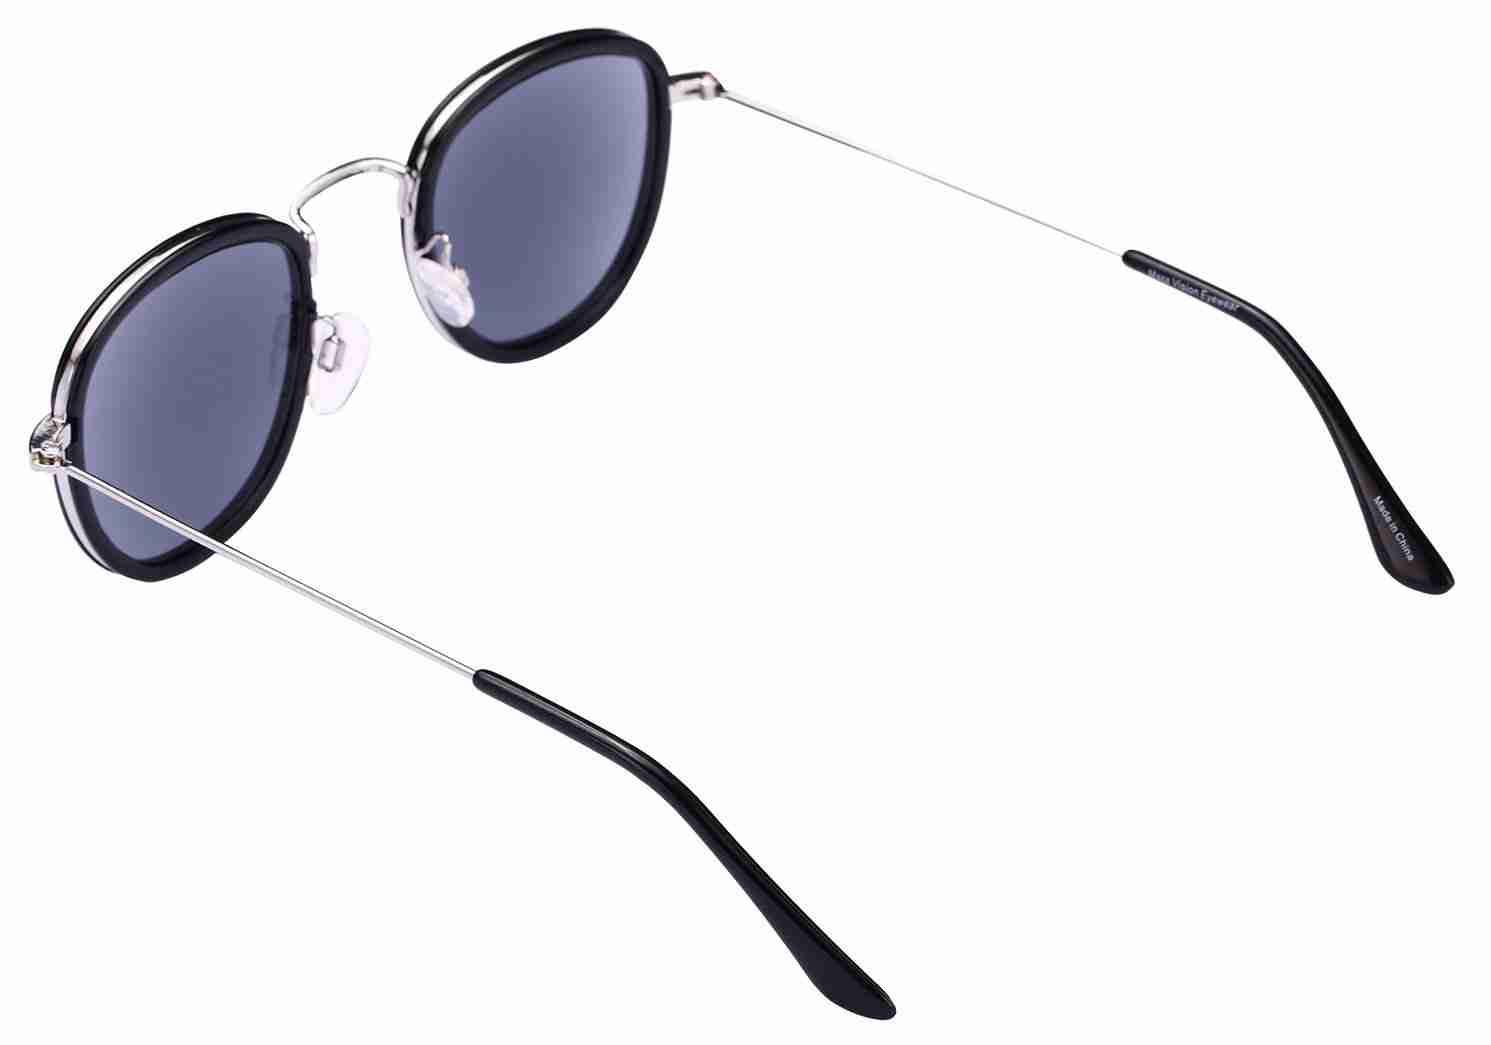 Mass-Vision-Eyewear-The-Esteemed-Reading-Sunglasses-Black-Inside